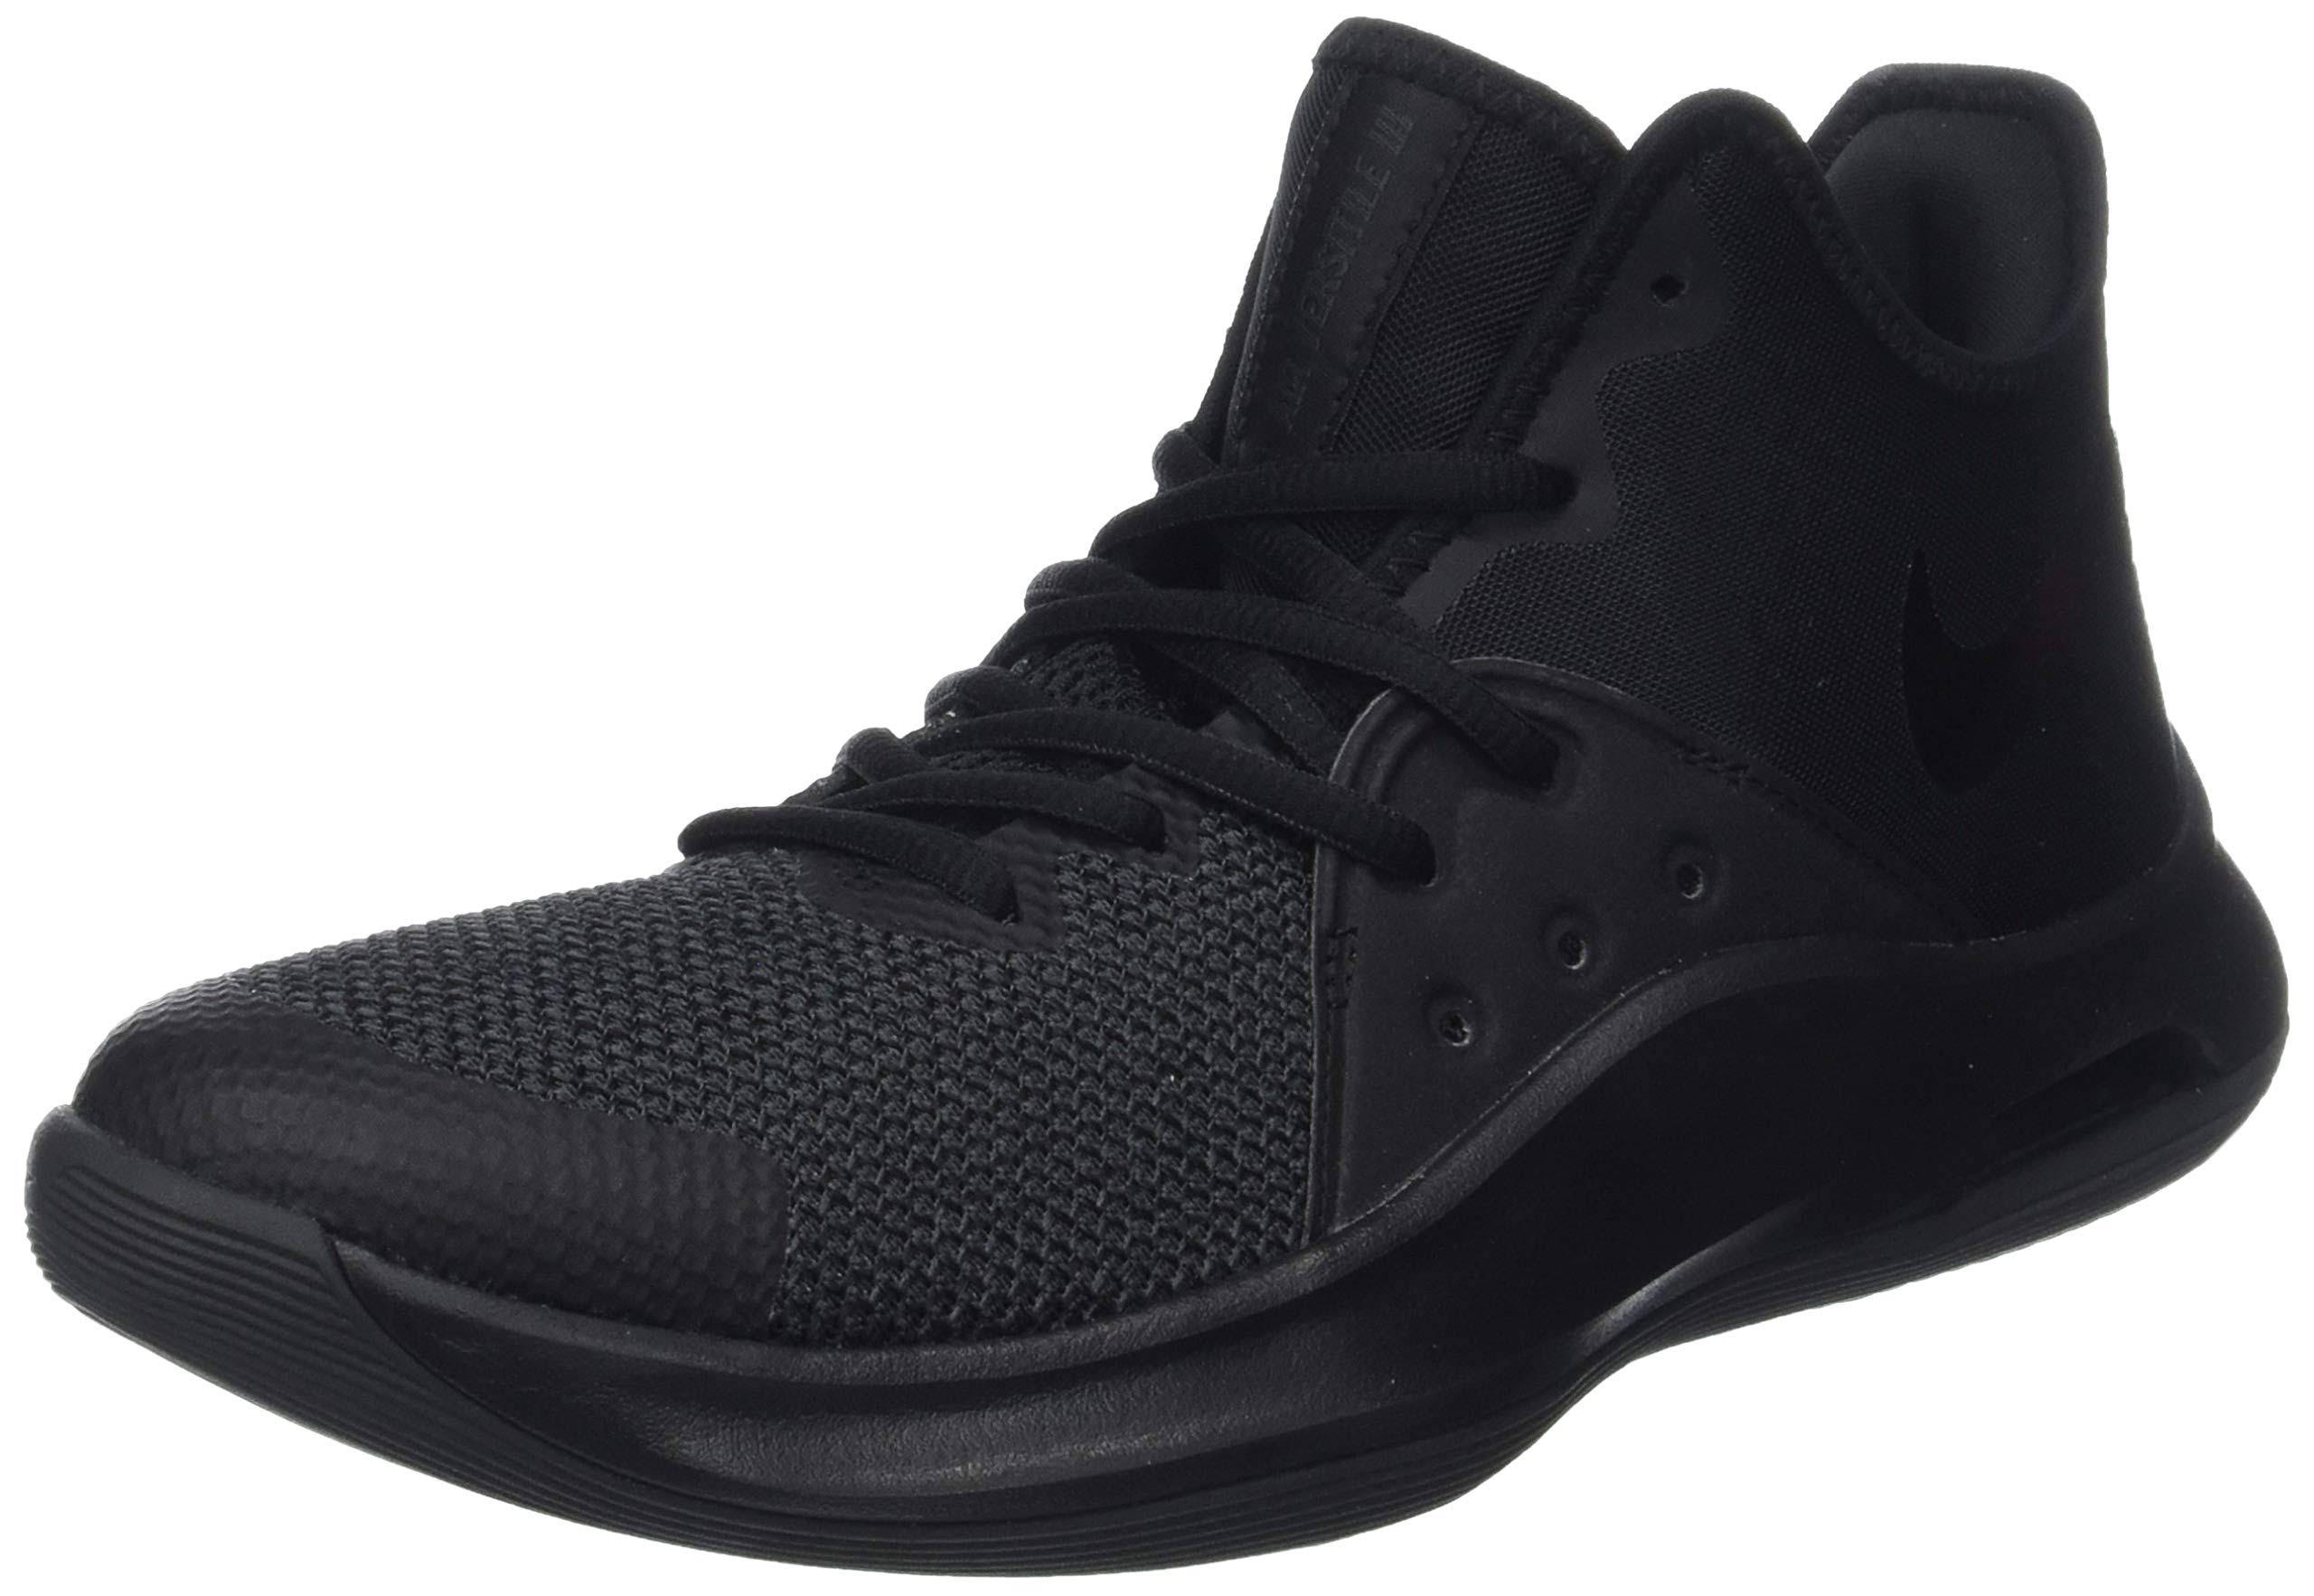 Nike Air Versitile III - Men's Basketball Shoes